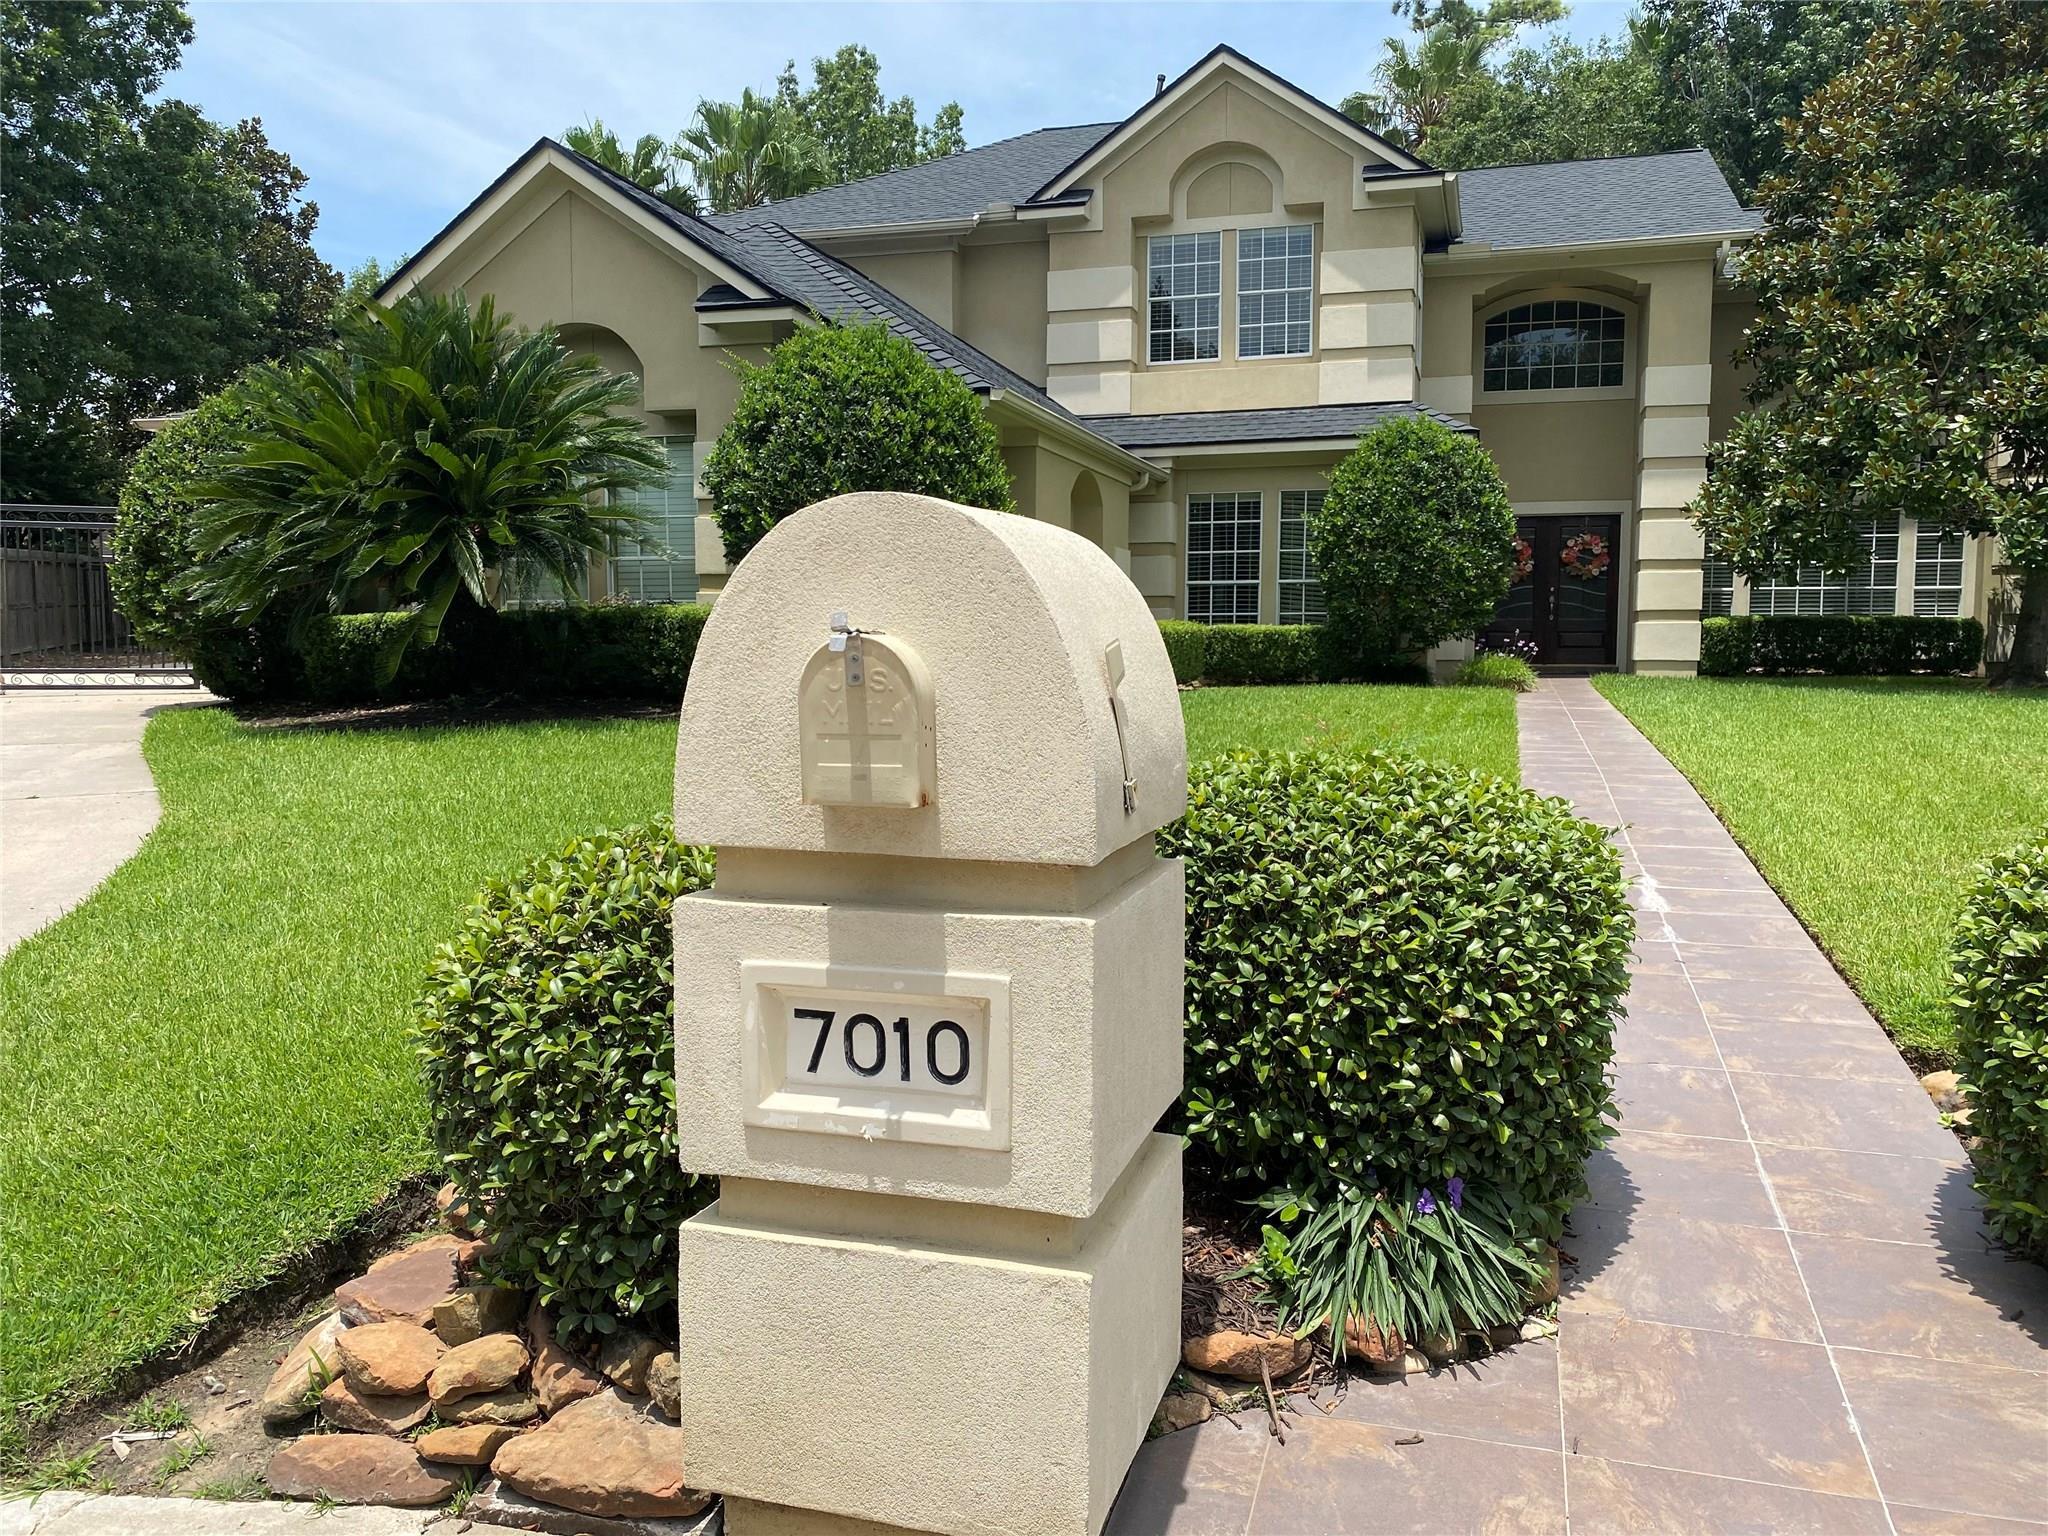 7010 Centre Oaks Drive Property Photo - Houston, TX real estate listing